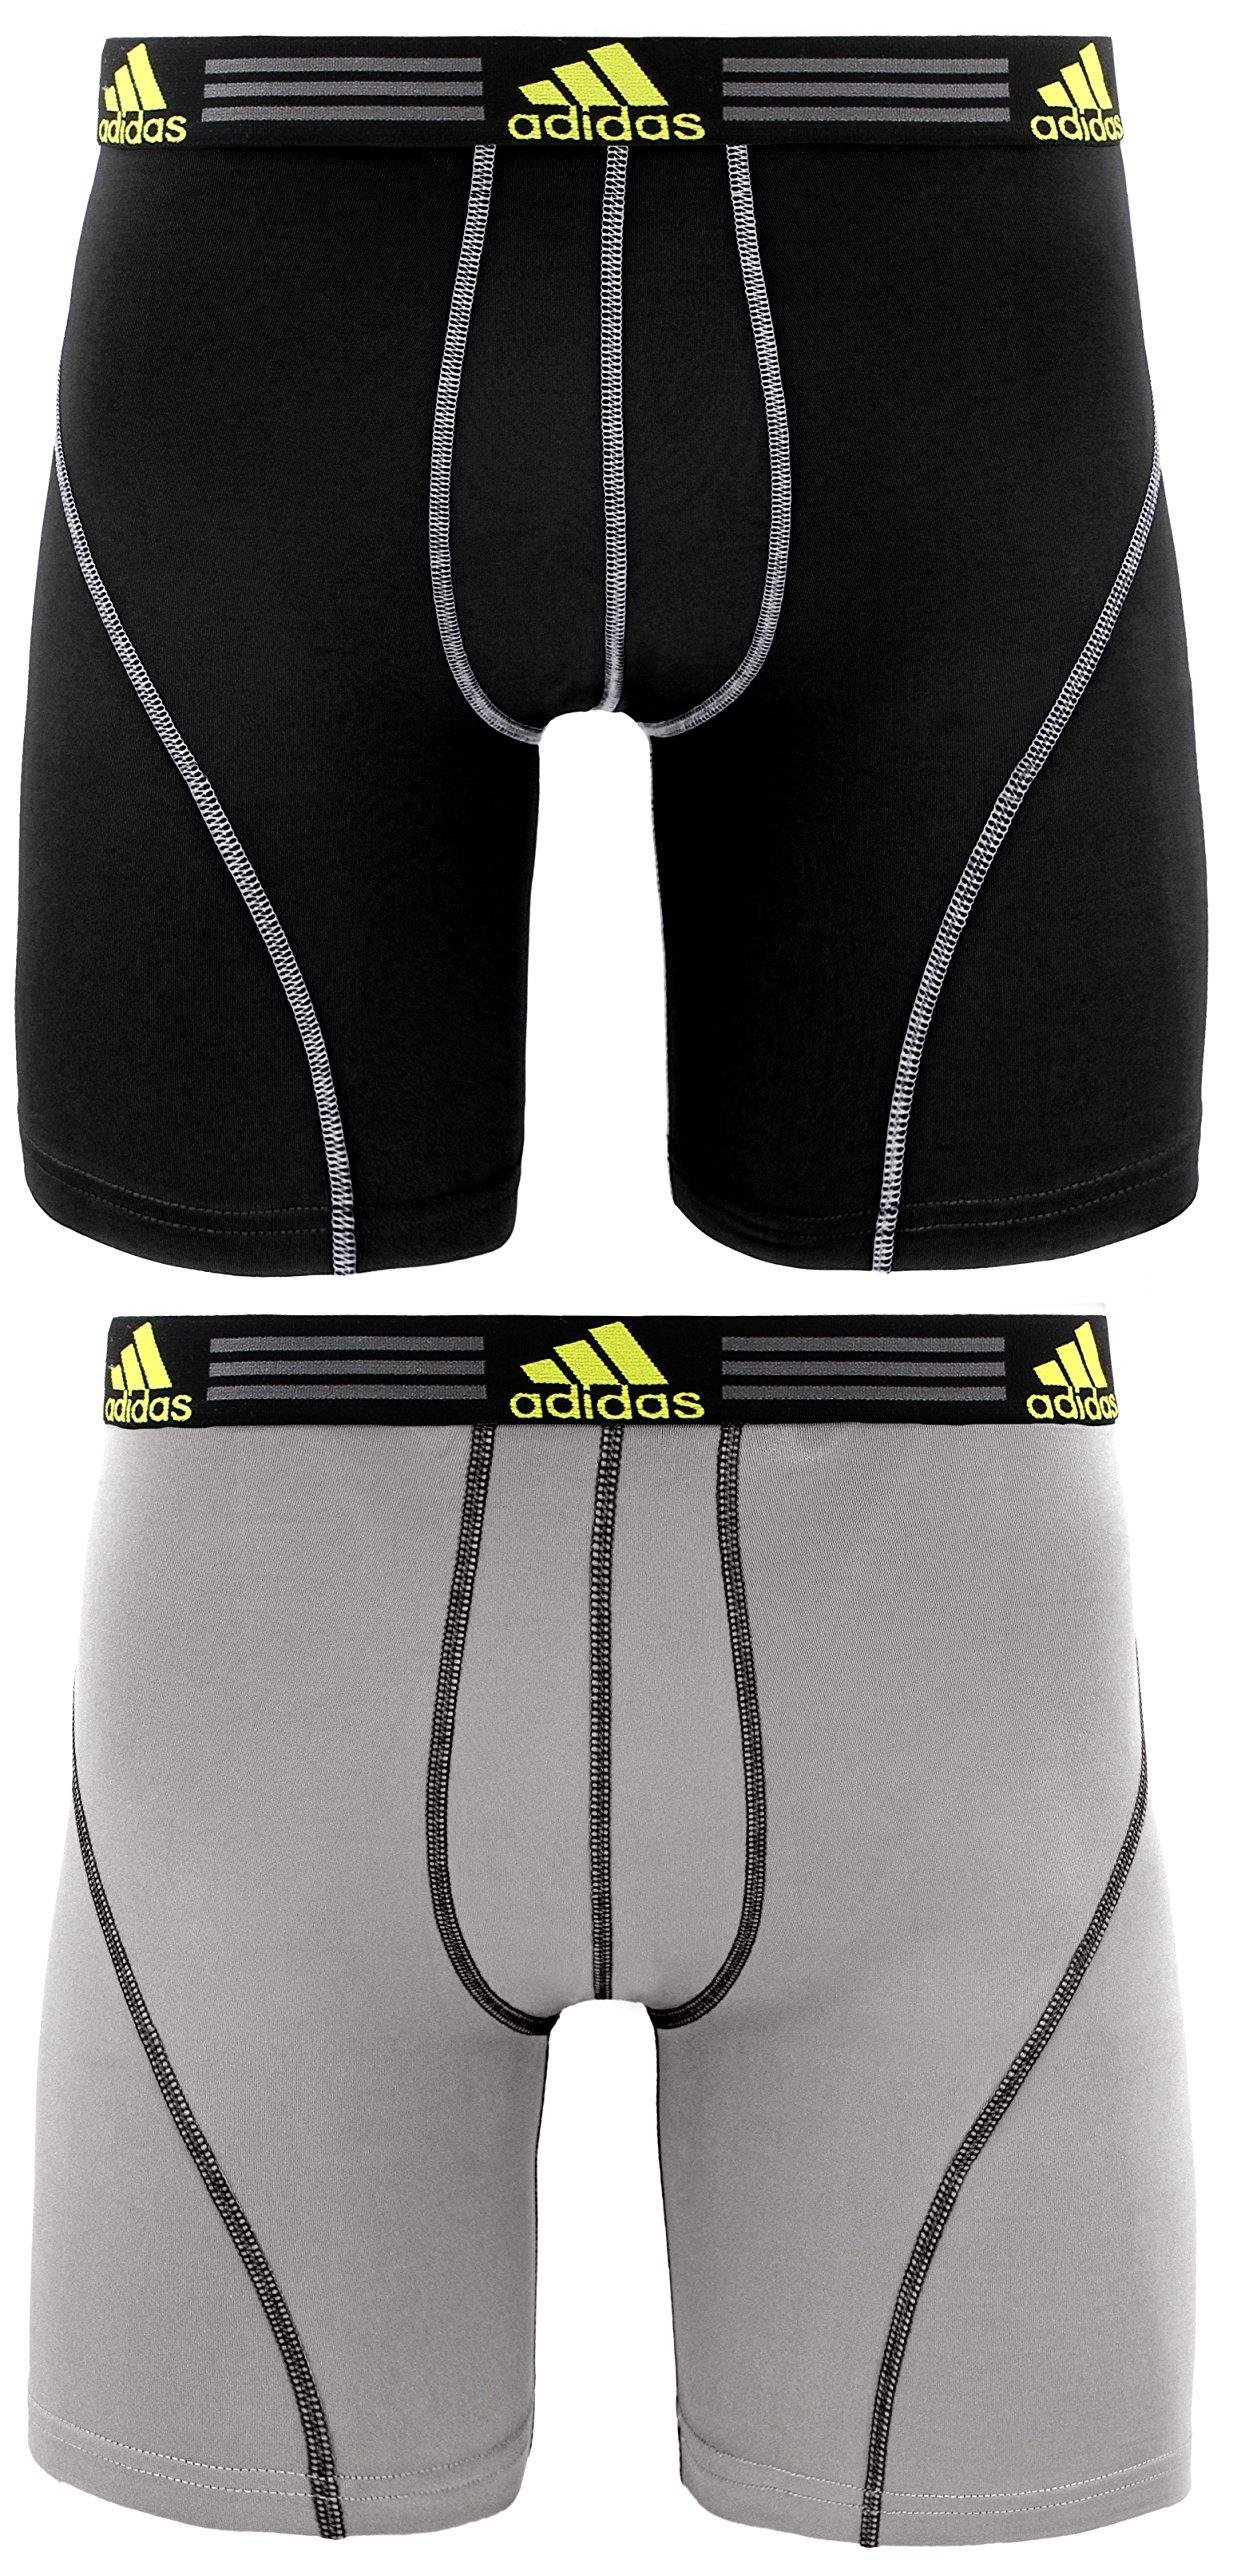 adidas Men's Sport Performance Climalite Midway Underwear (2 Pack)